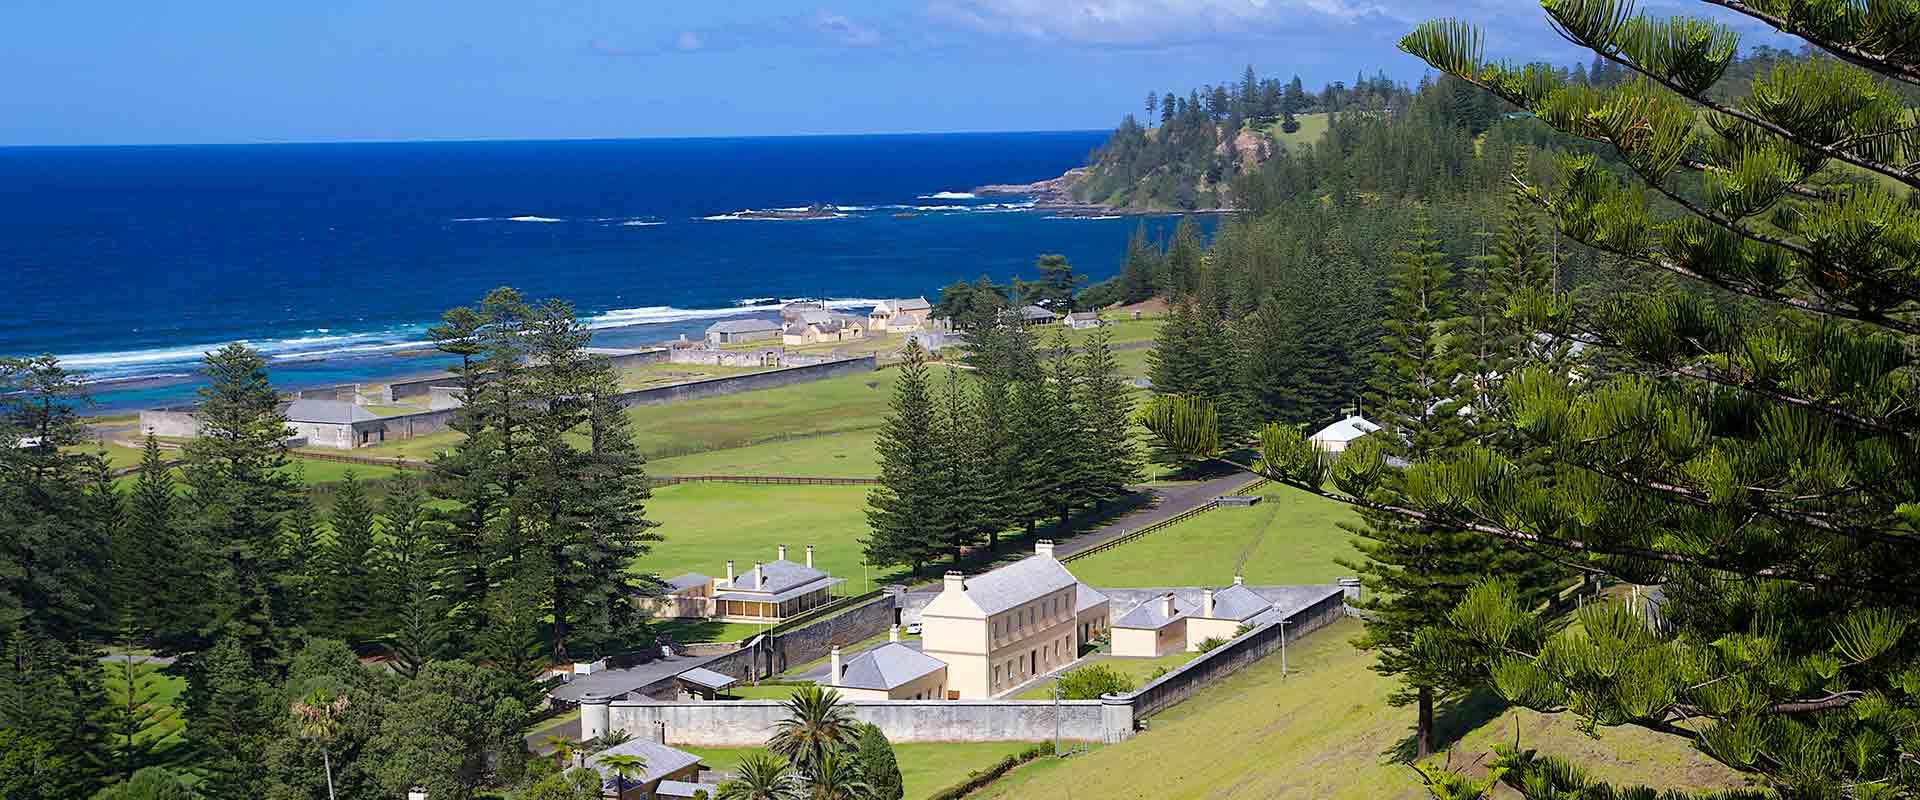 Norfolk Island History & Gardens